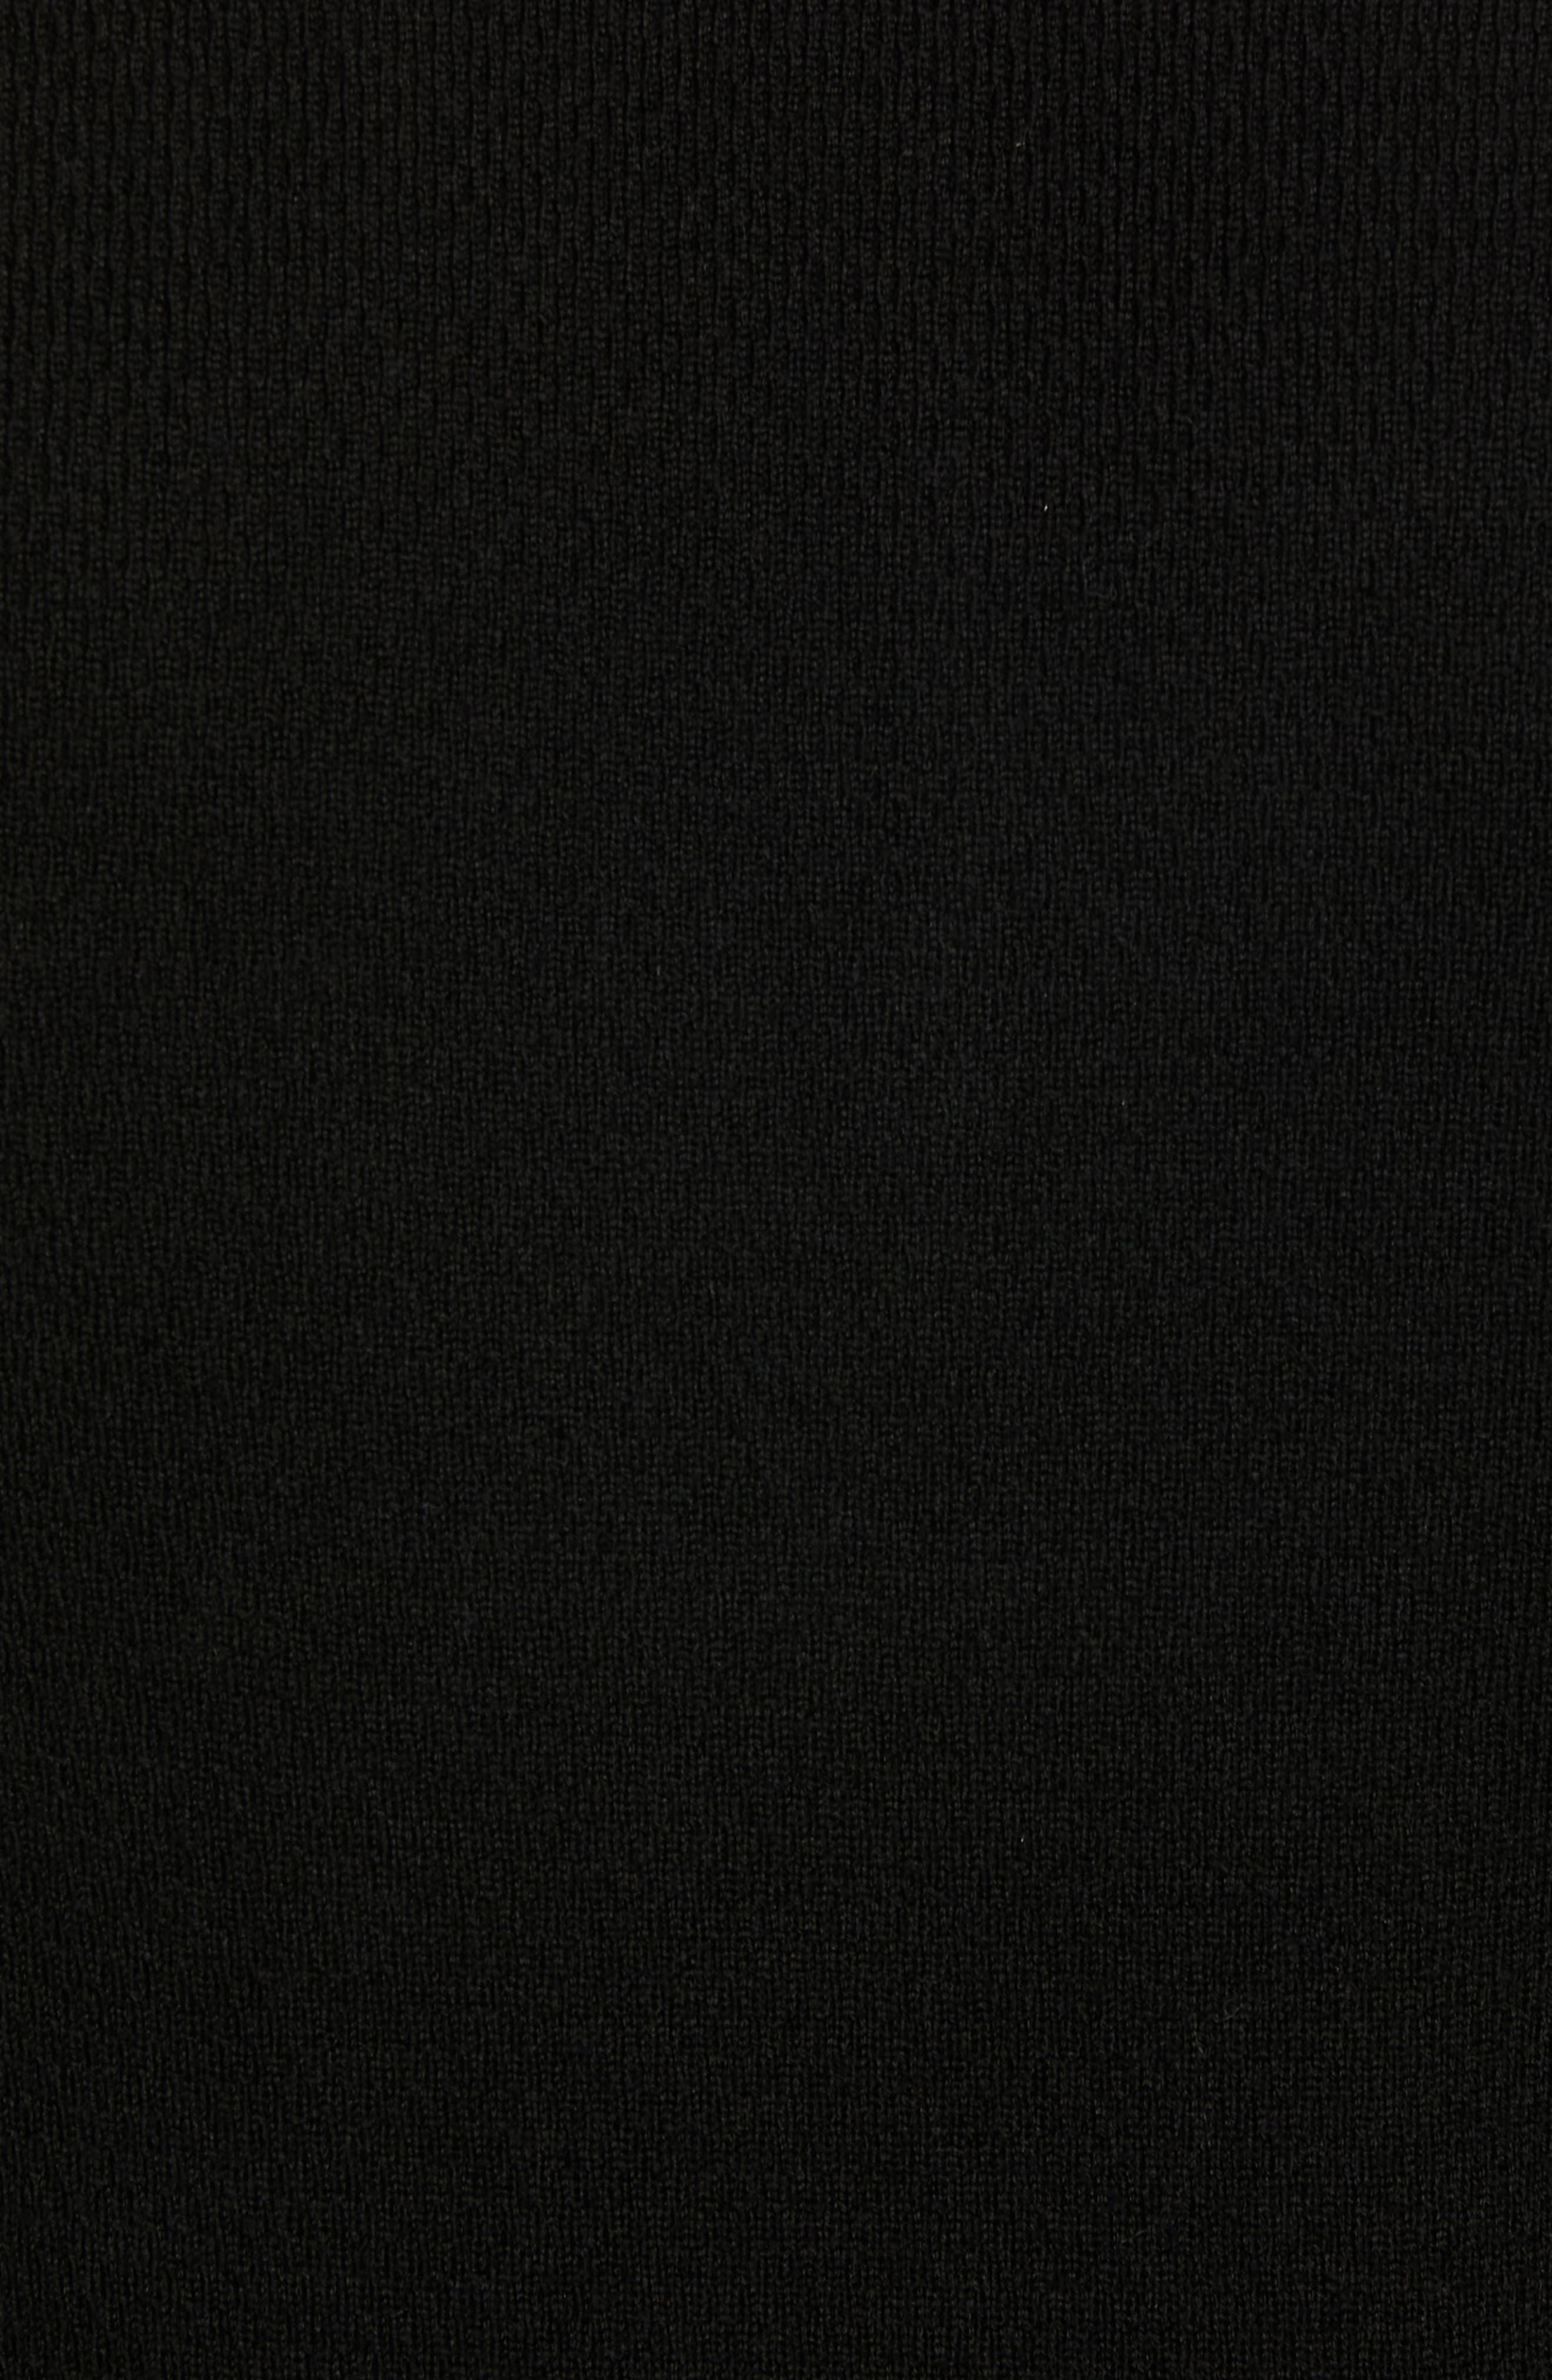 Gregory Merino Wool Blend Thermal Henley,                             Alternate thumbnail 5, color,                             BLACK